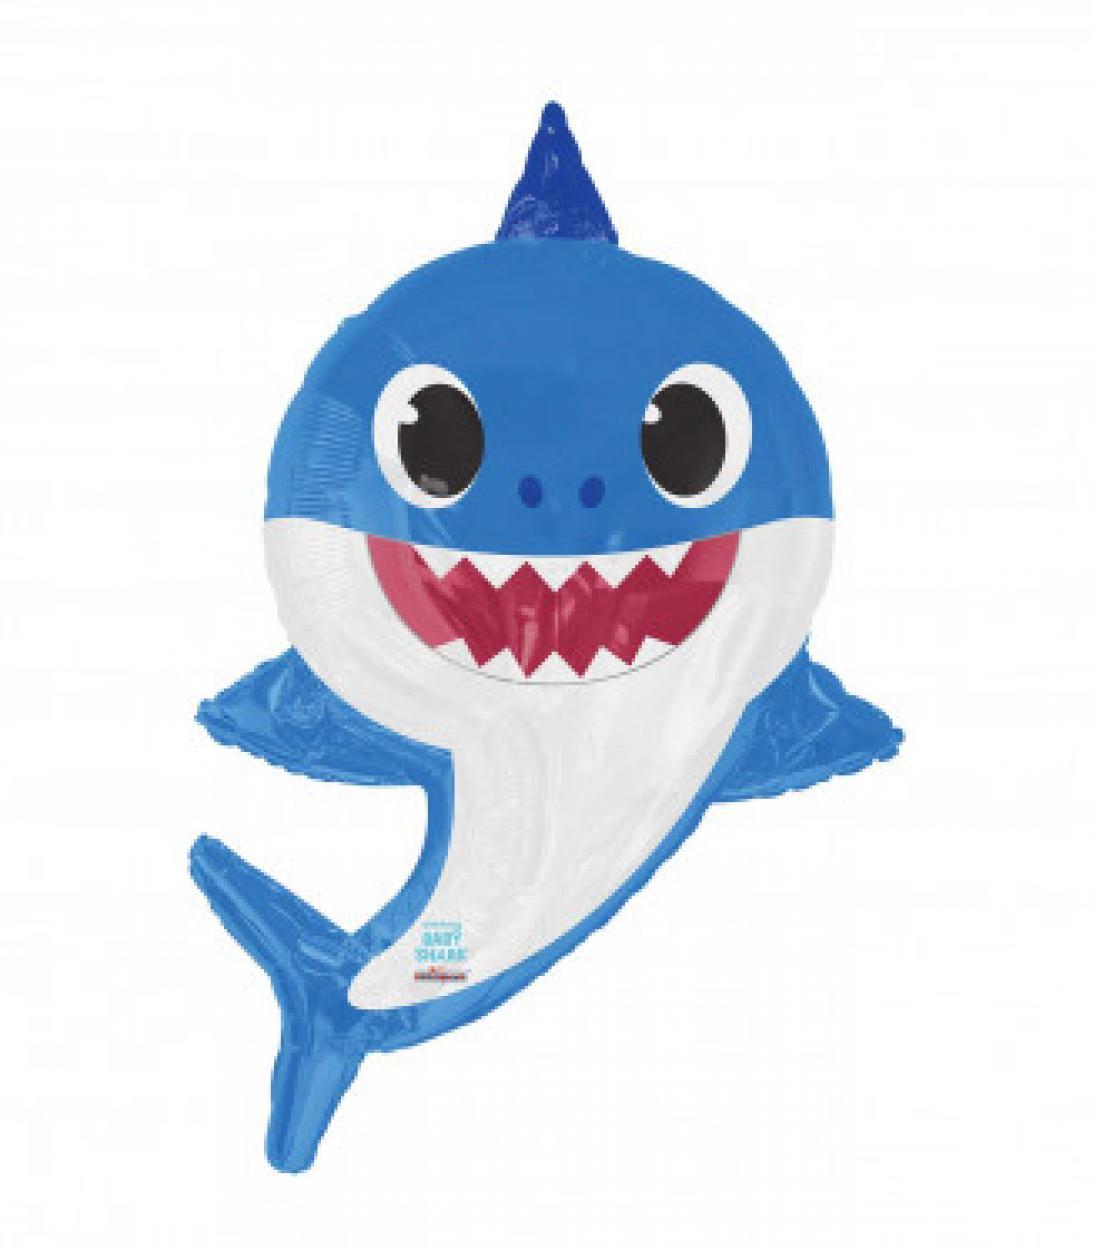 SUPERSHAPE BABY SHARK PAPA' SHARK 28791